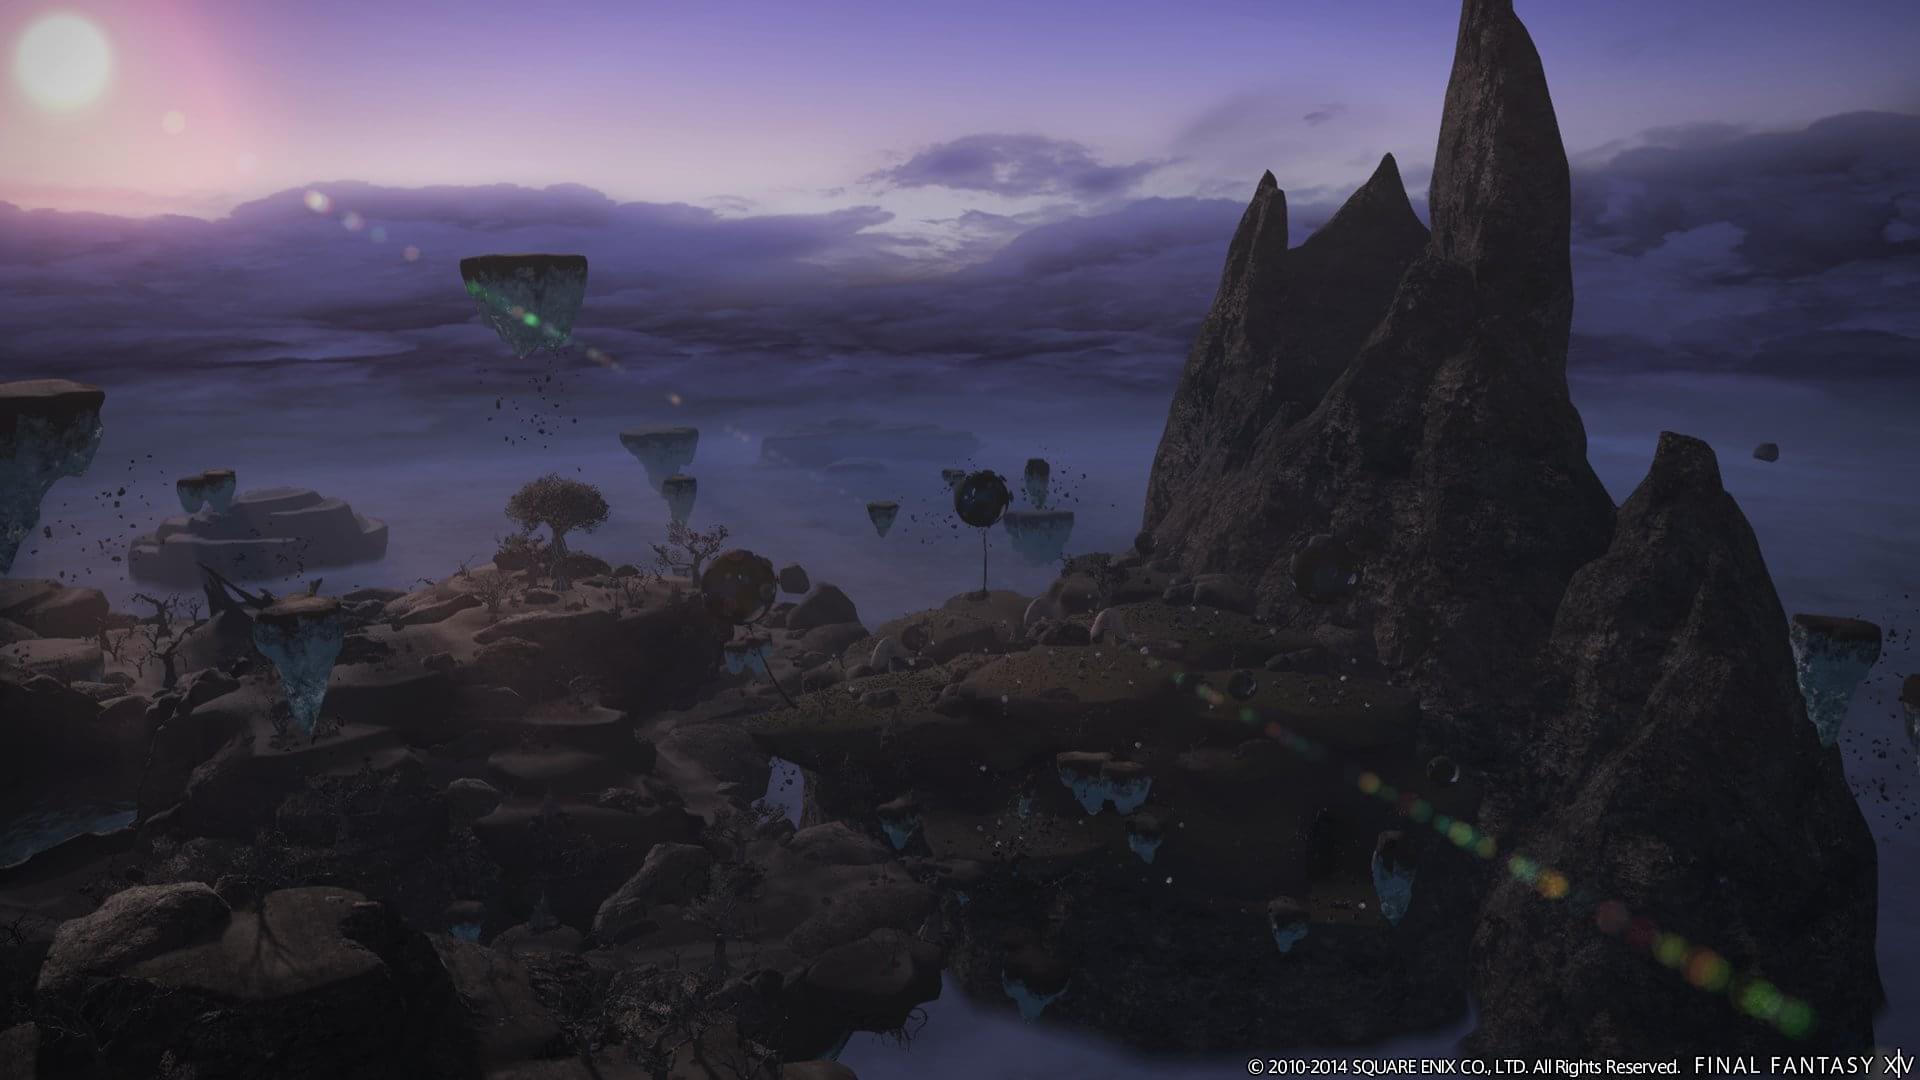 Novas imagens de Final Fantasy XIV: Heavensward, confira